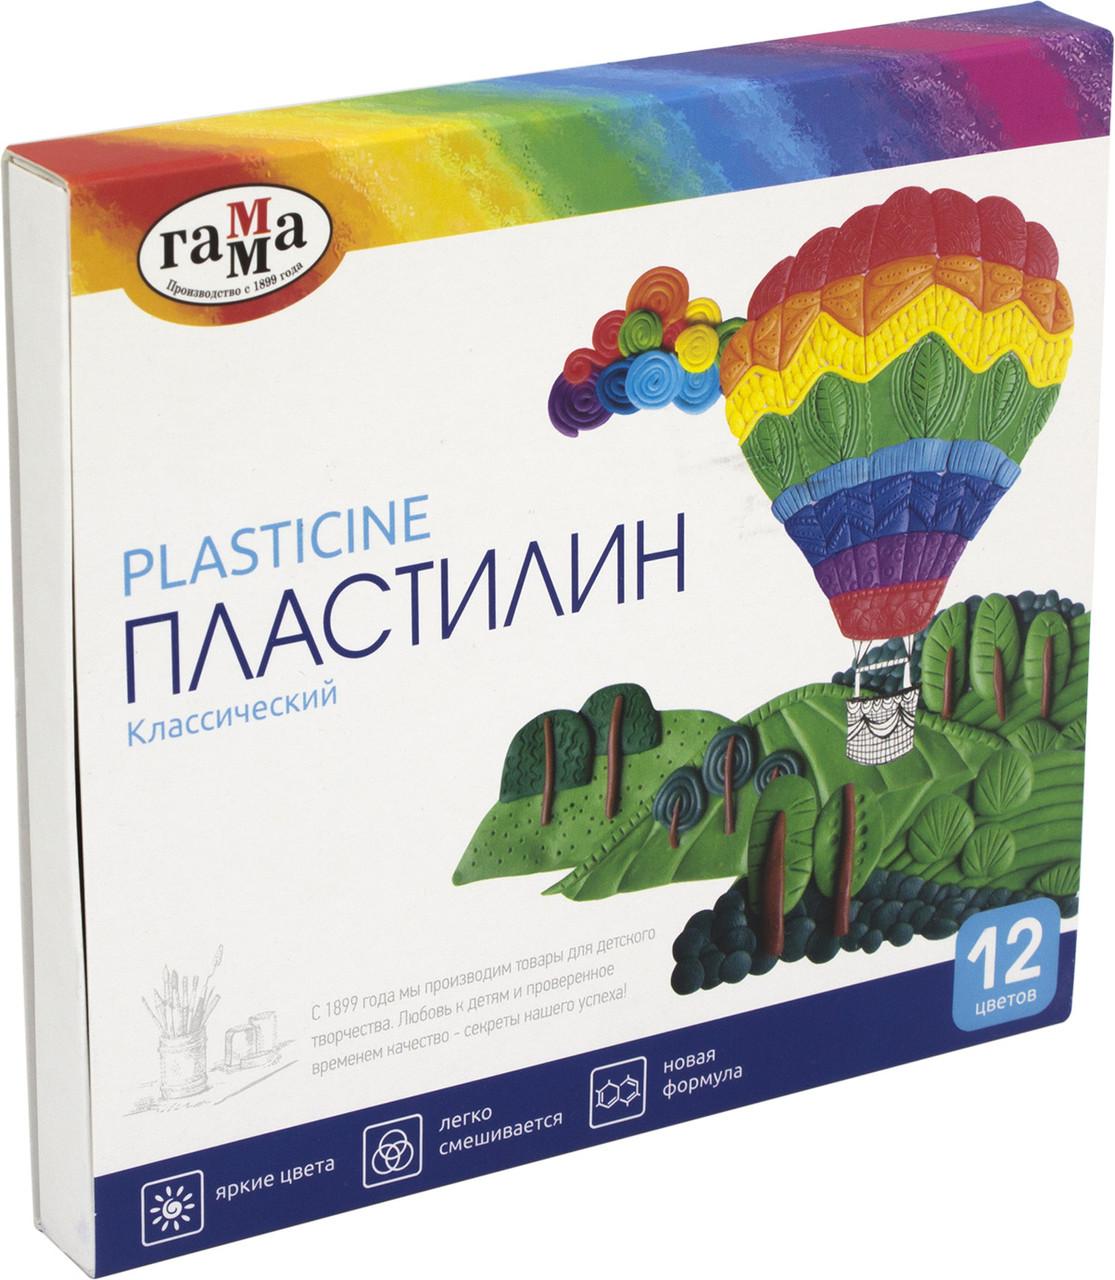 "Пластилін 12 кольор. 240гр ""Гамма"" Класичний №281033(16)"